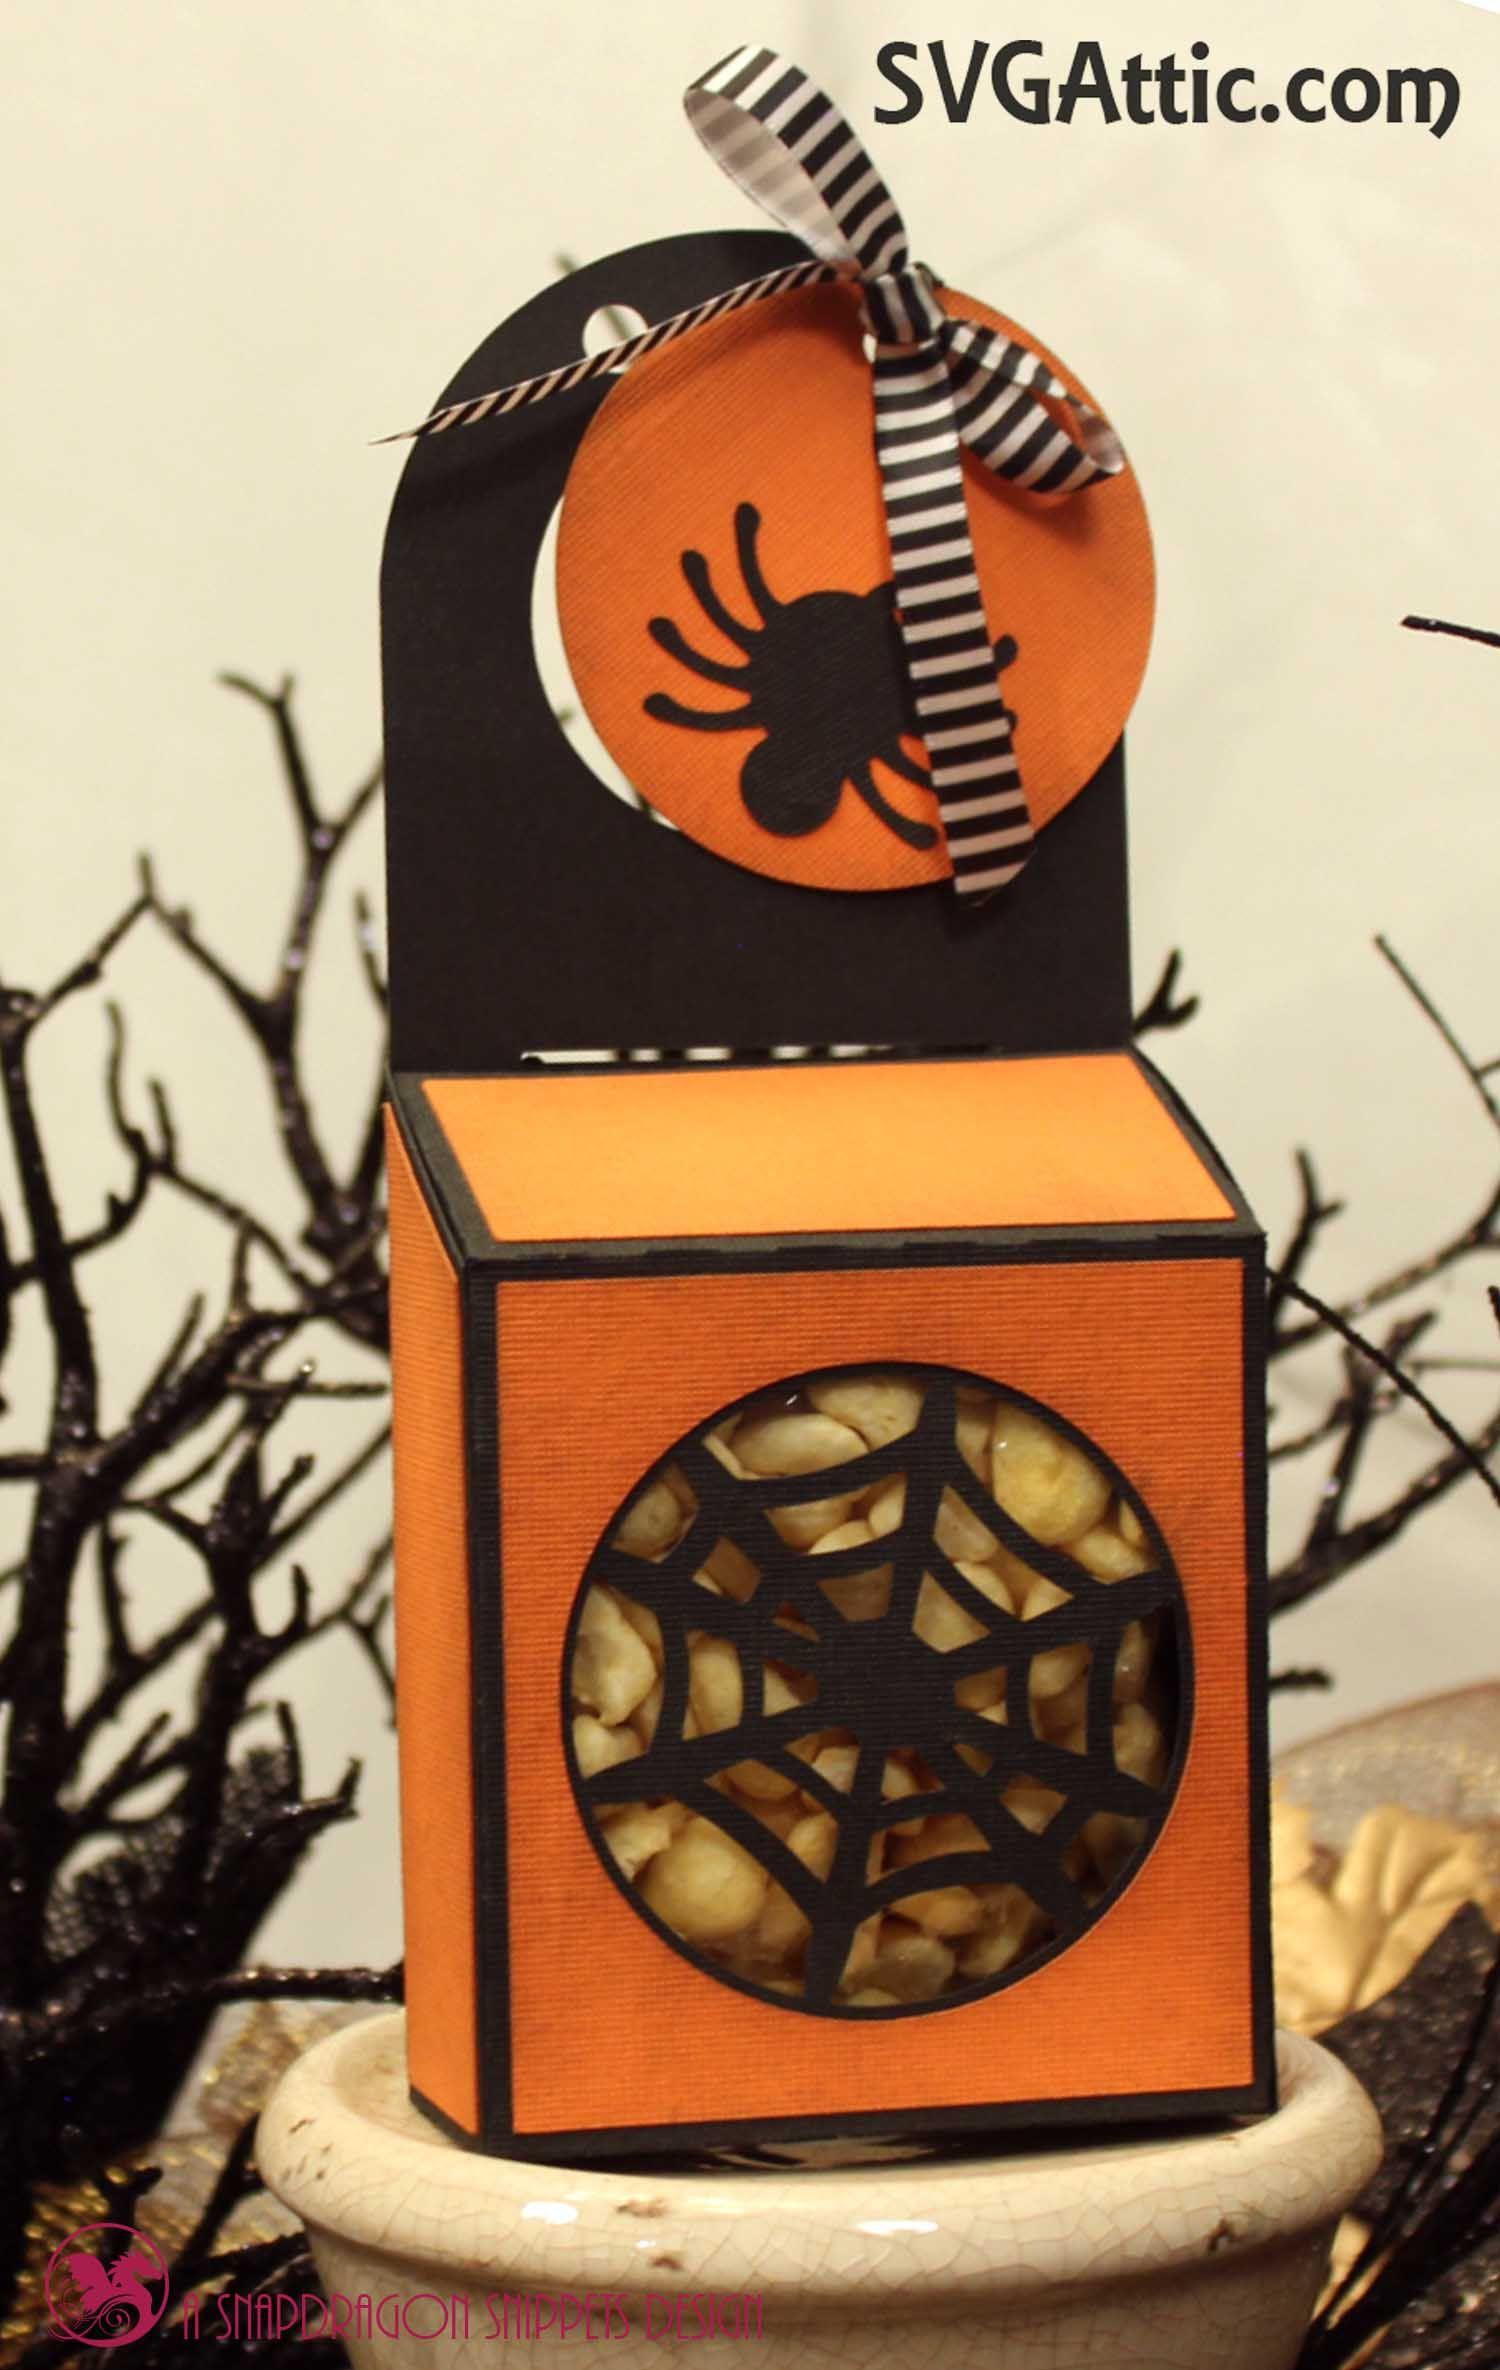 JGW SteampunkHex Spider Web box Halloween SVG svgattic